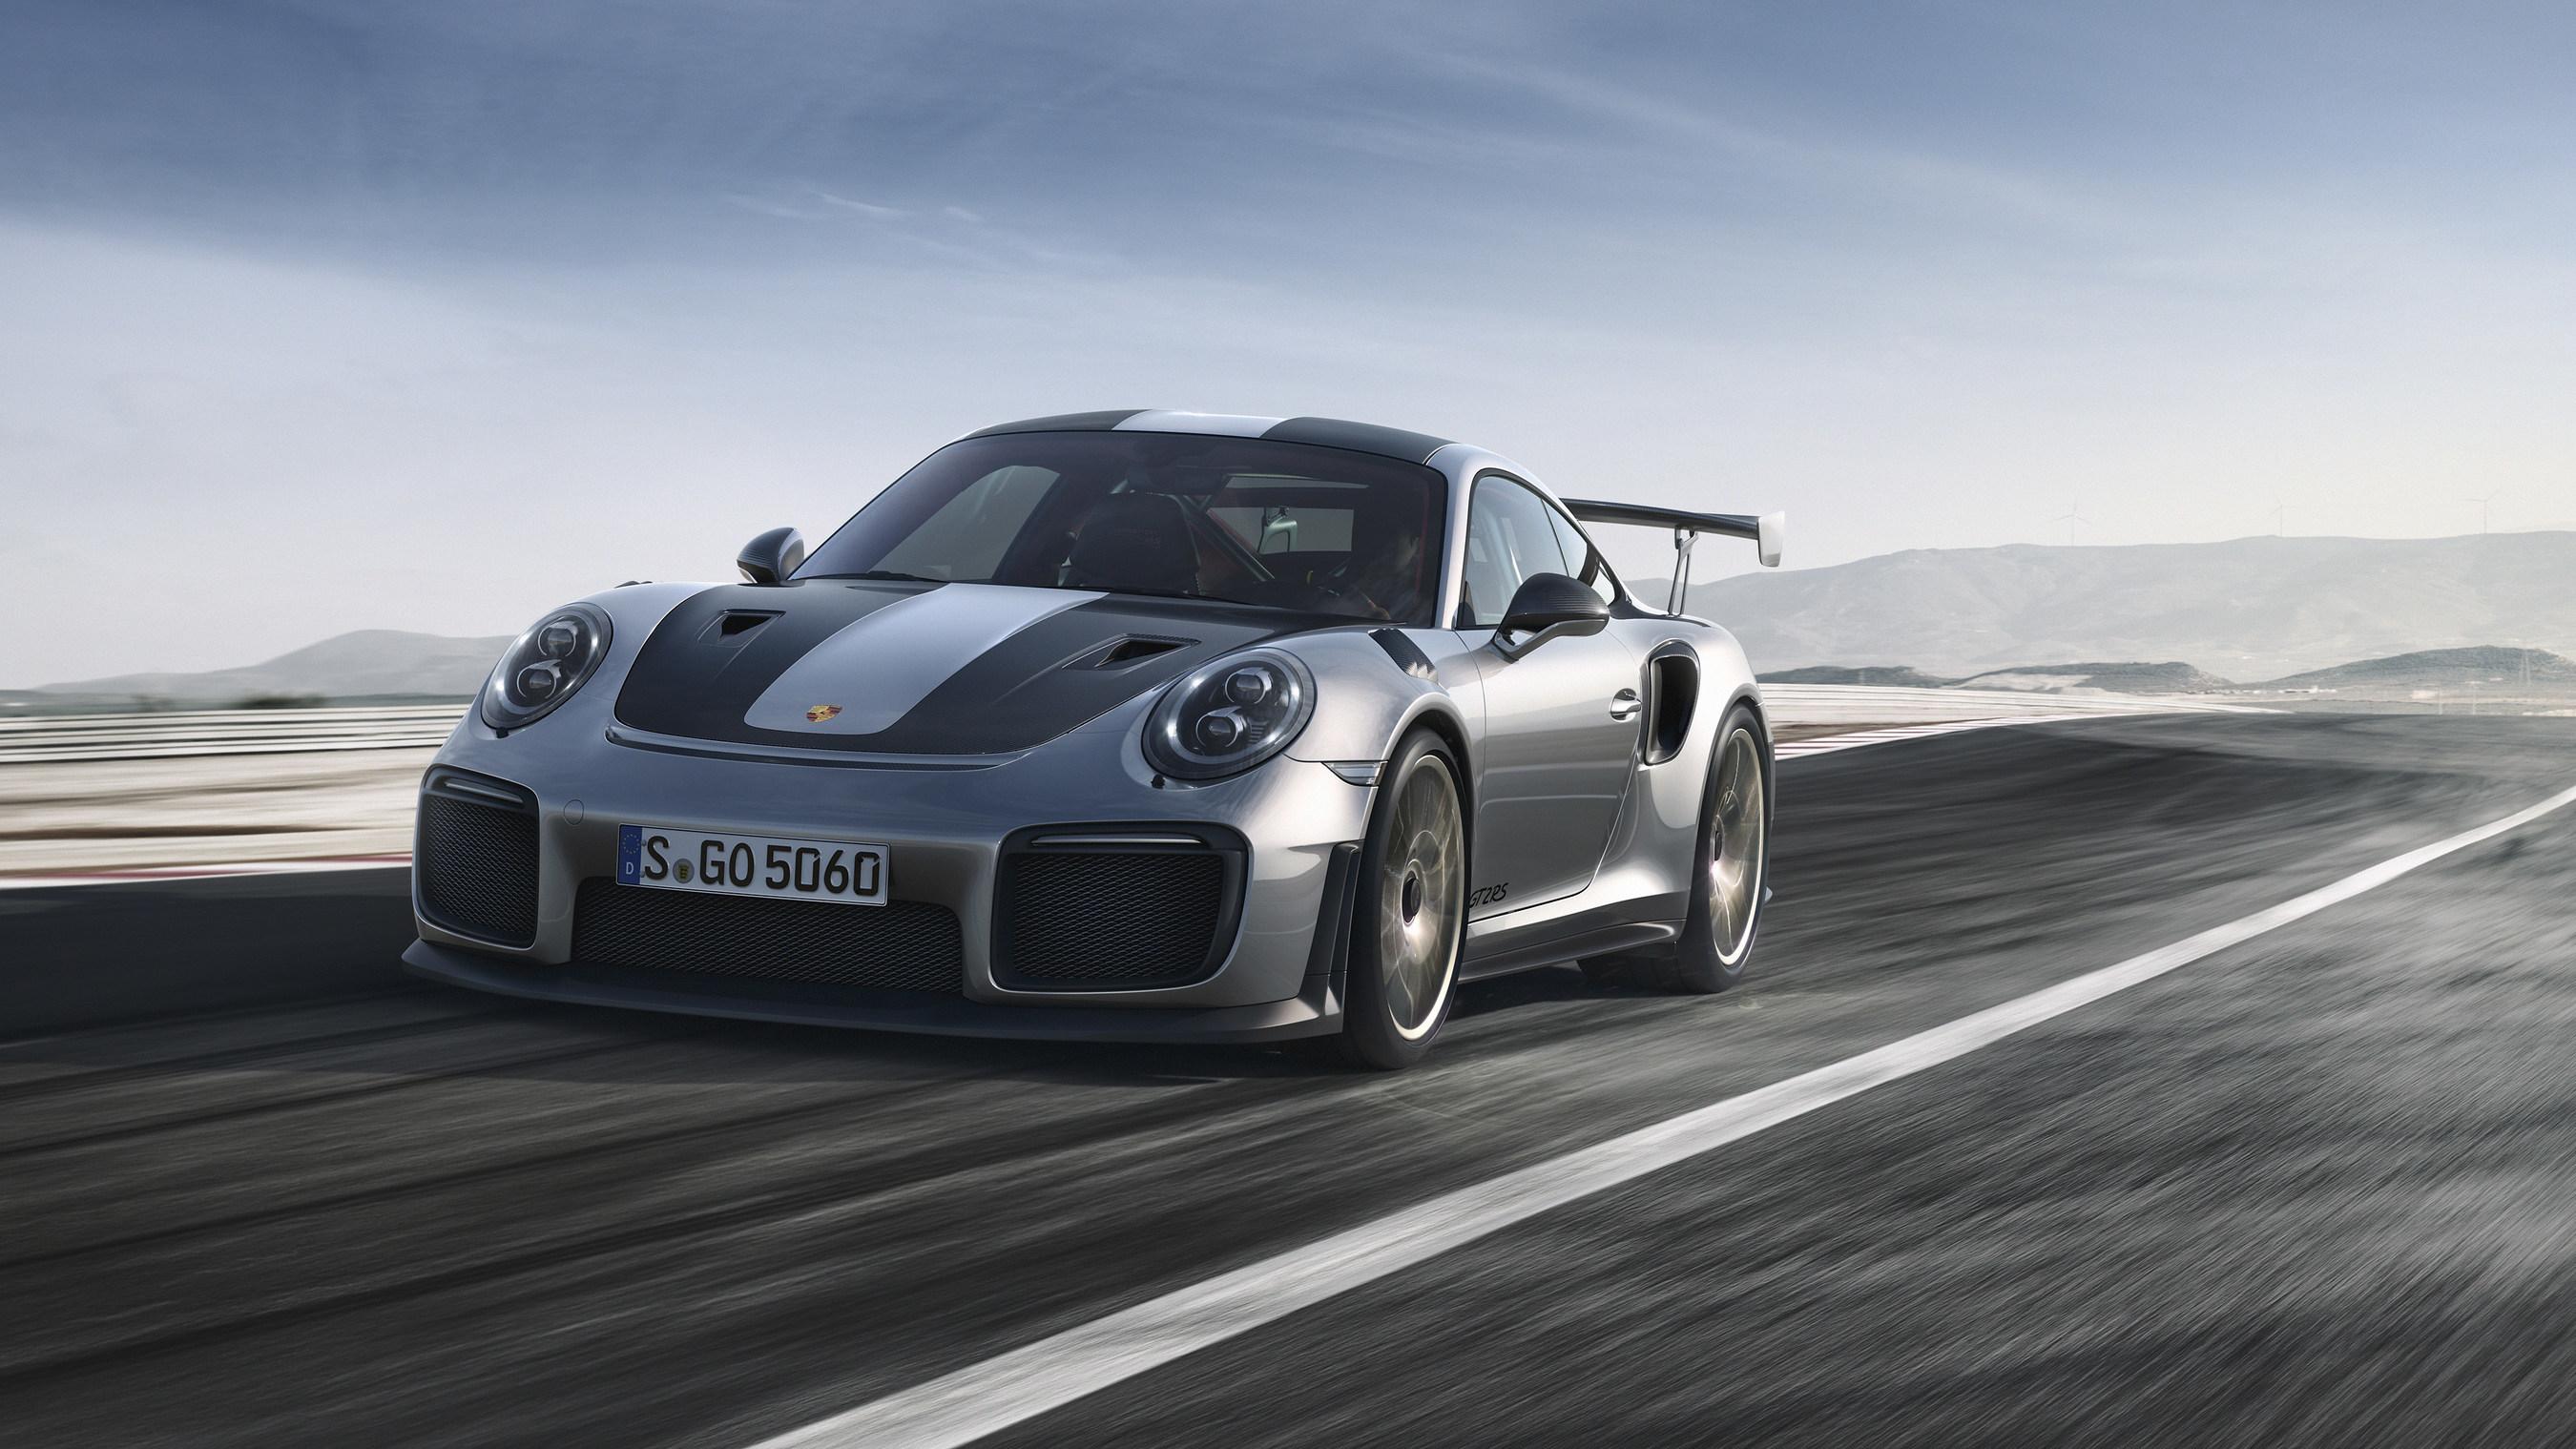 0a998bfa450 Porsche_Cars_Canada_Porsche_unveils_the_most_powerful_911_of_all.jpg?p=publish